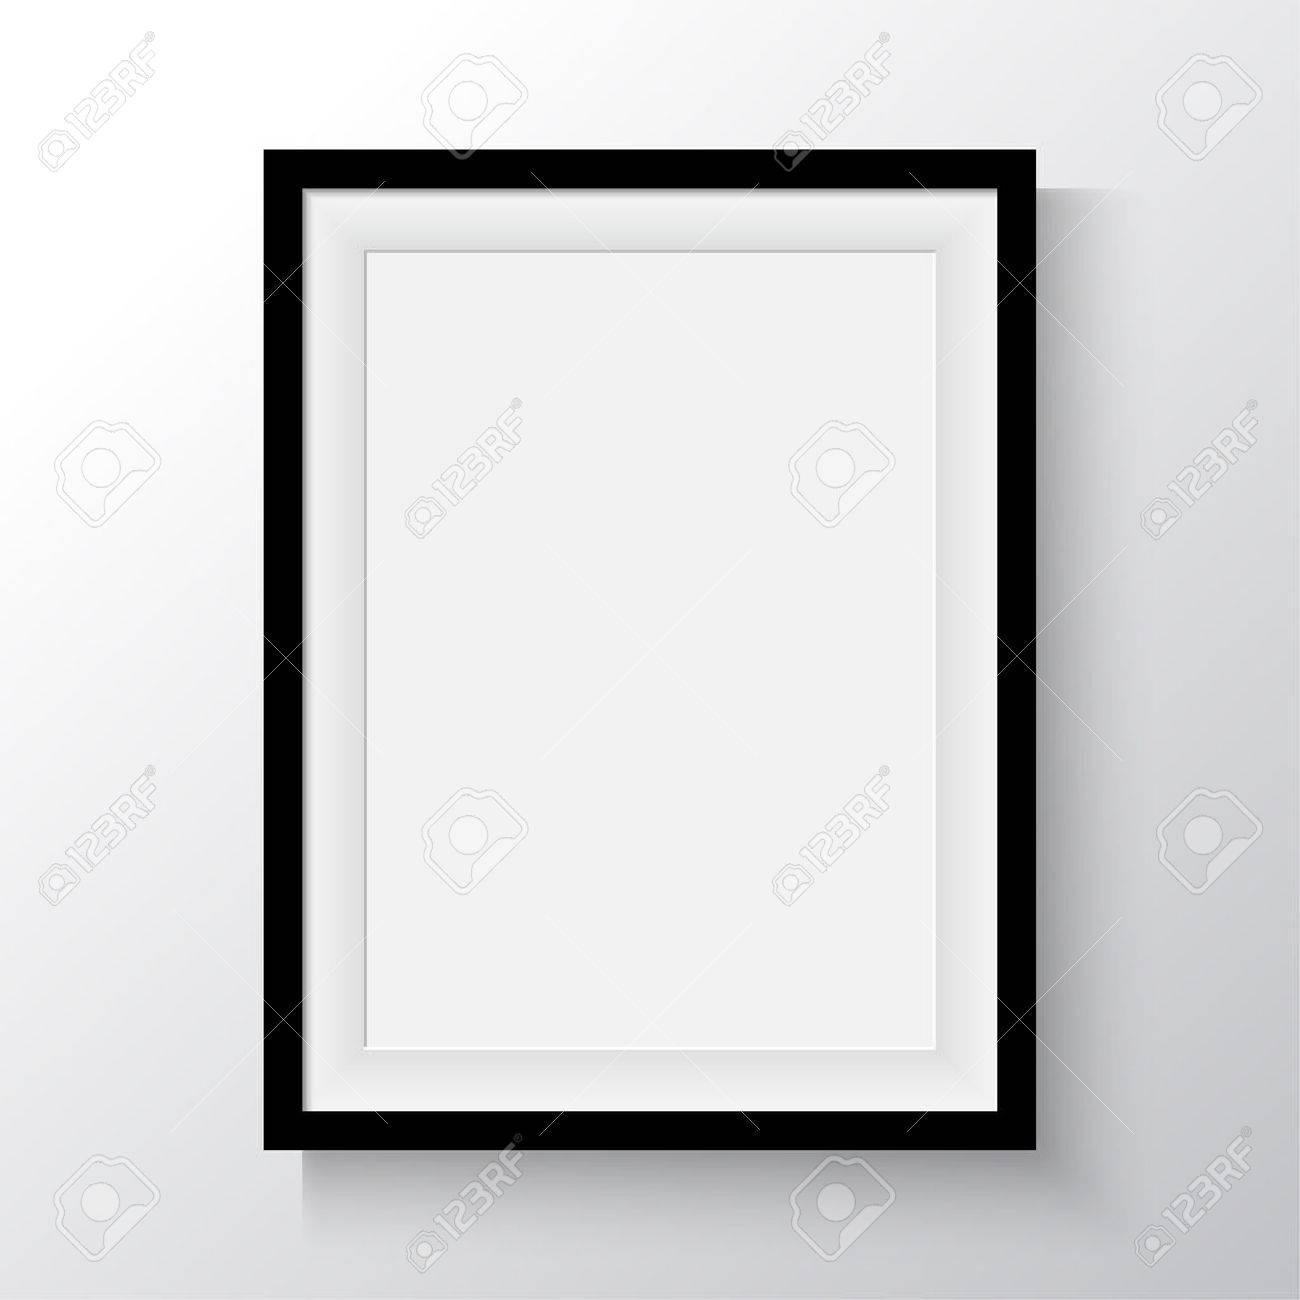 Marco Negro Para Pinturas O Fotografías En La Pared. A4, A3 Papel ...